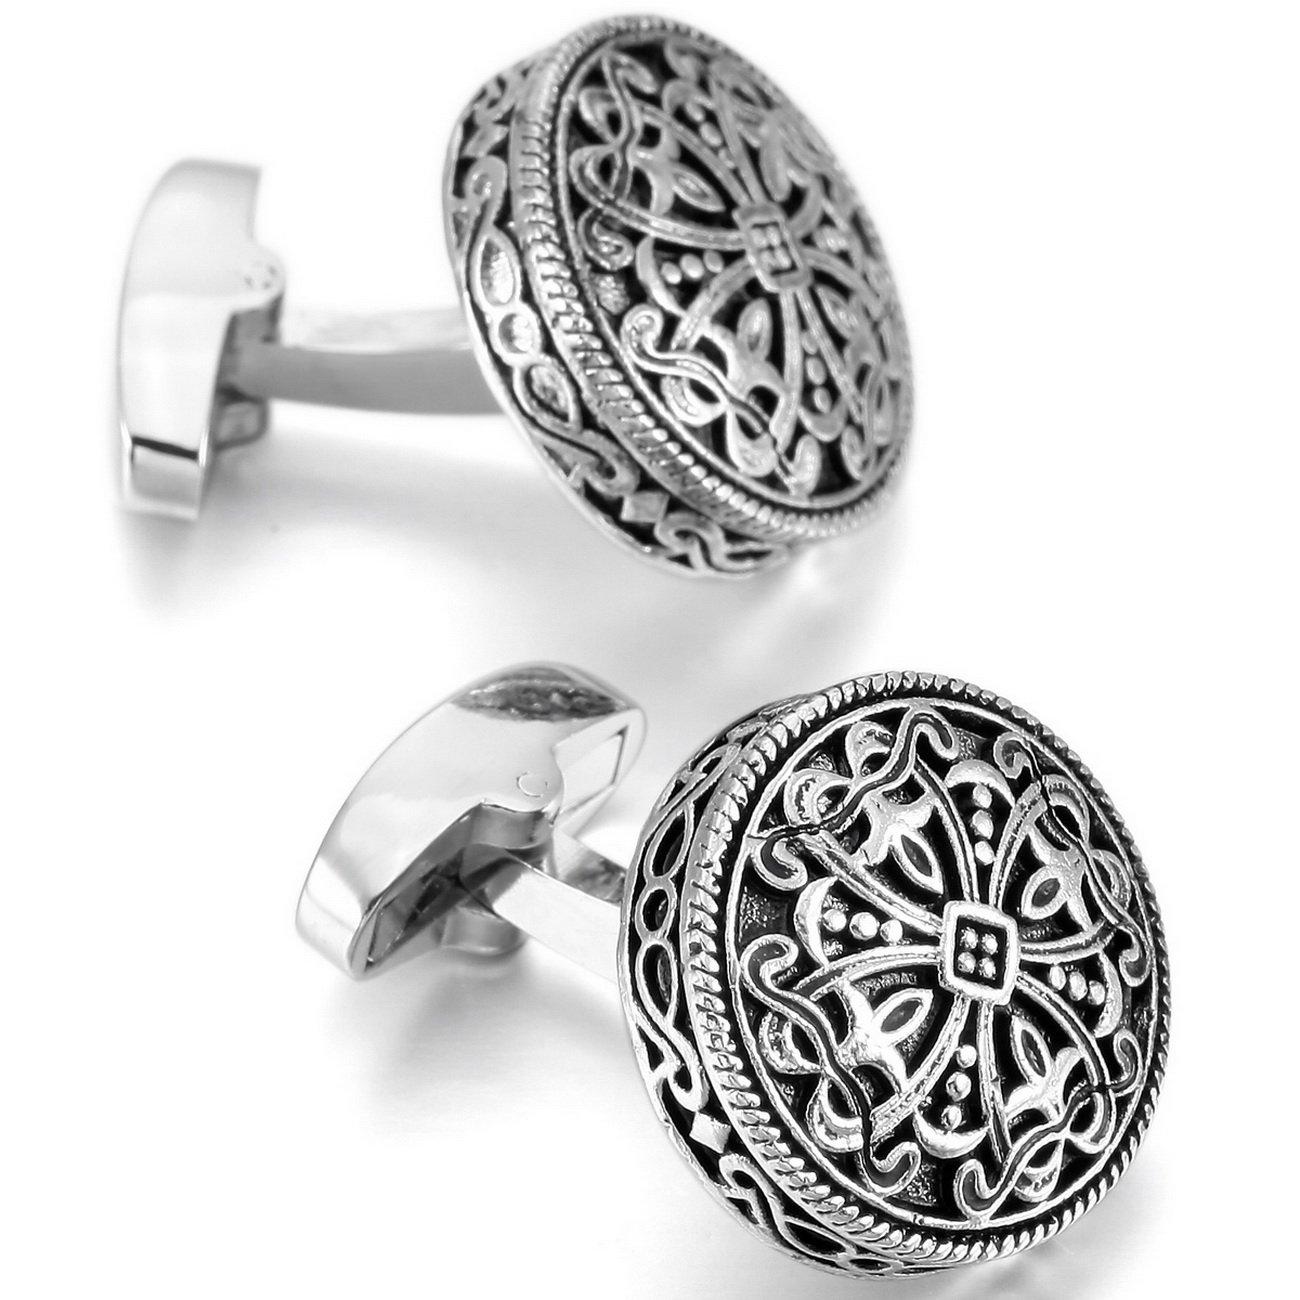 MOWOM Silver Tone Black 2PCS Rhodium Plated Cufflinks Celtic Cross Shirt Wedding Business